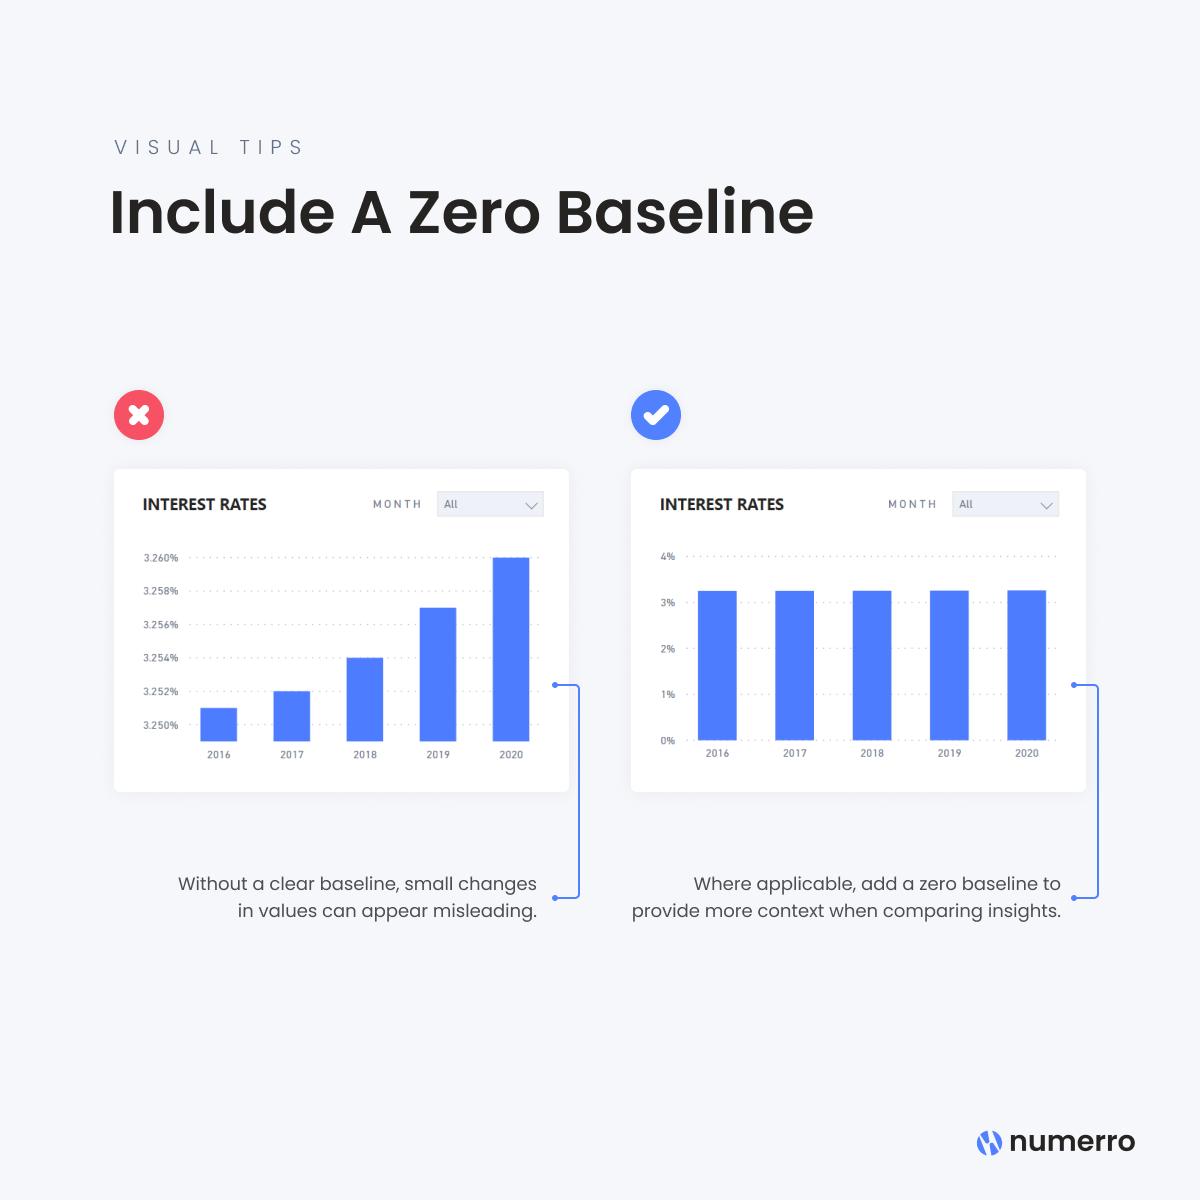 Include A Zero Baseline